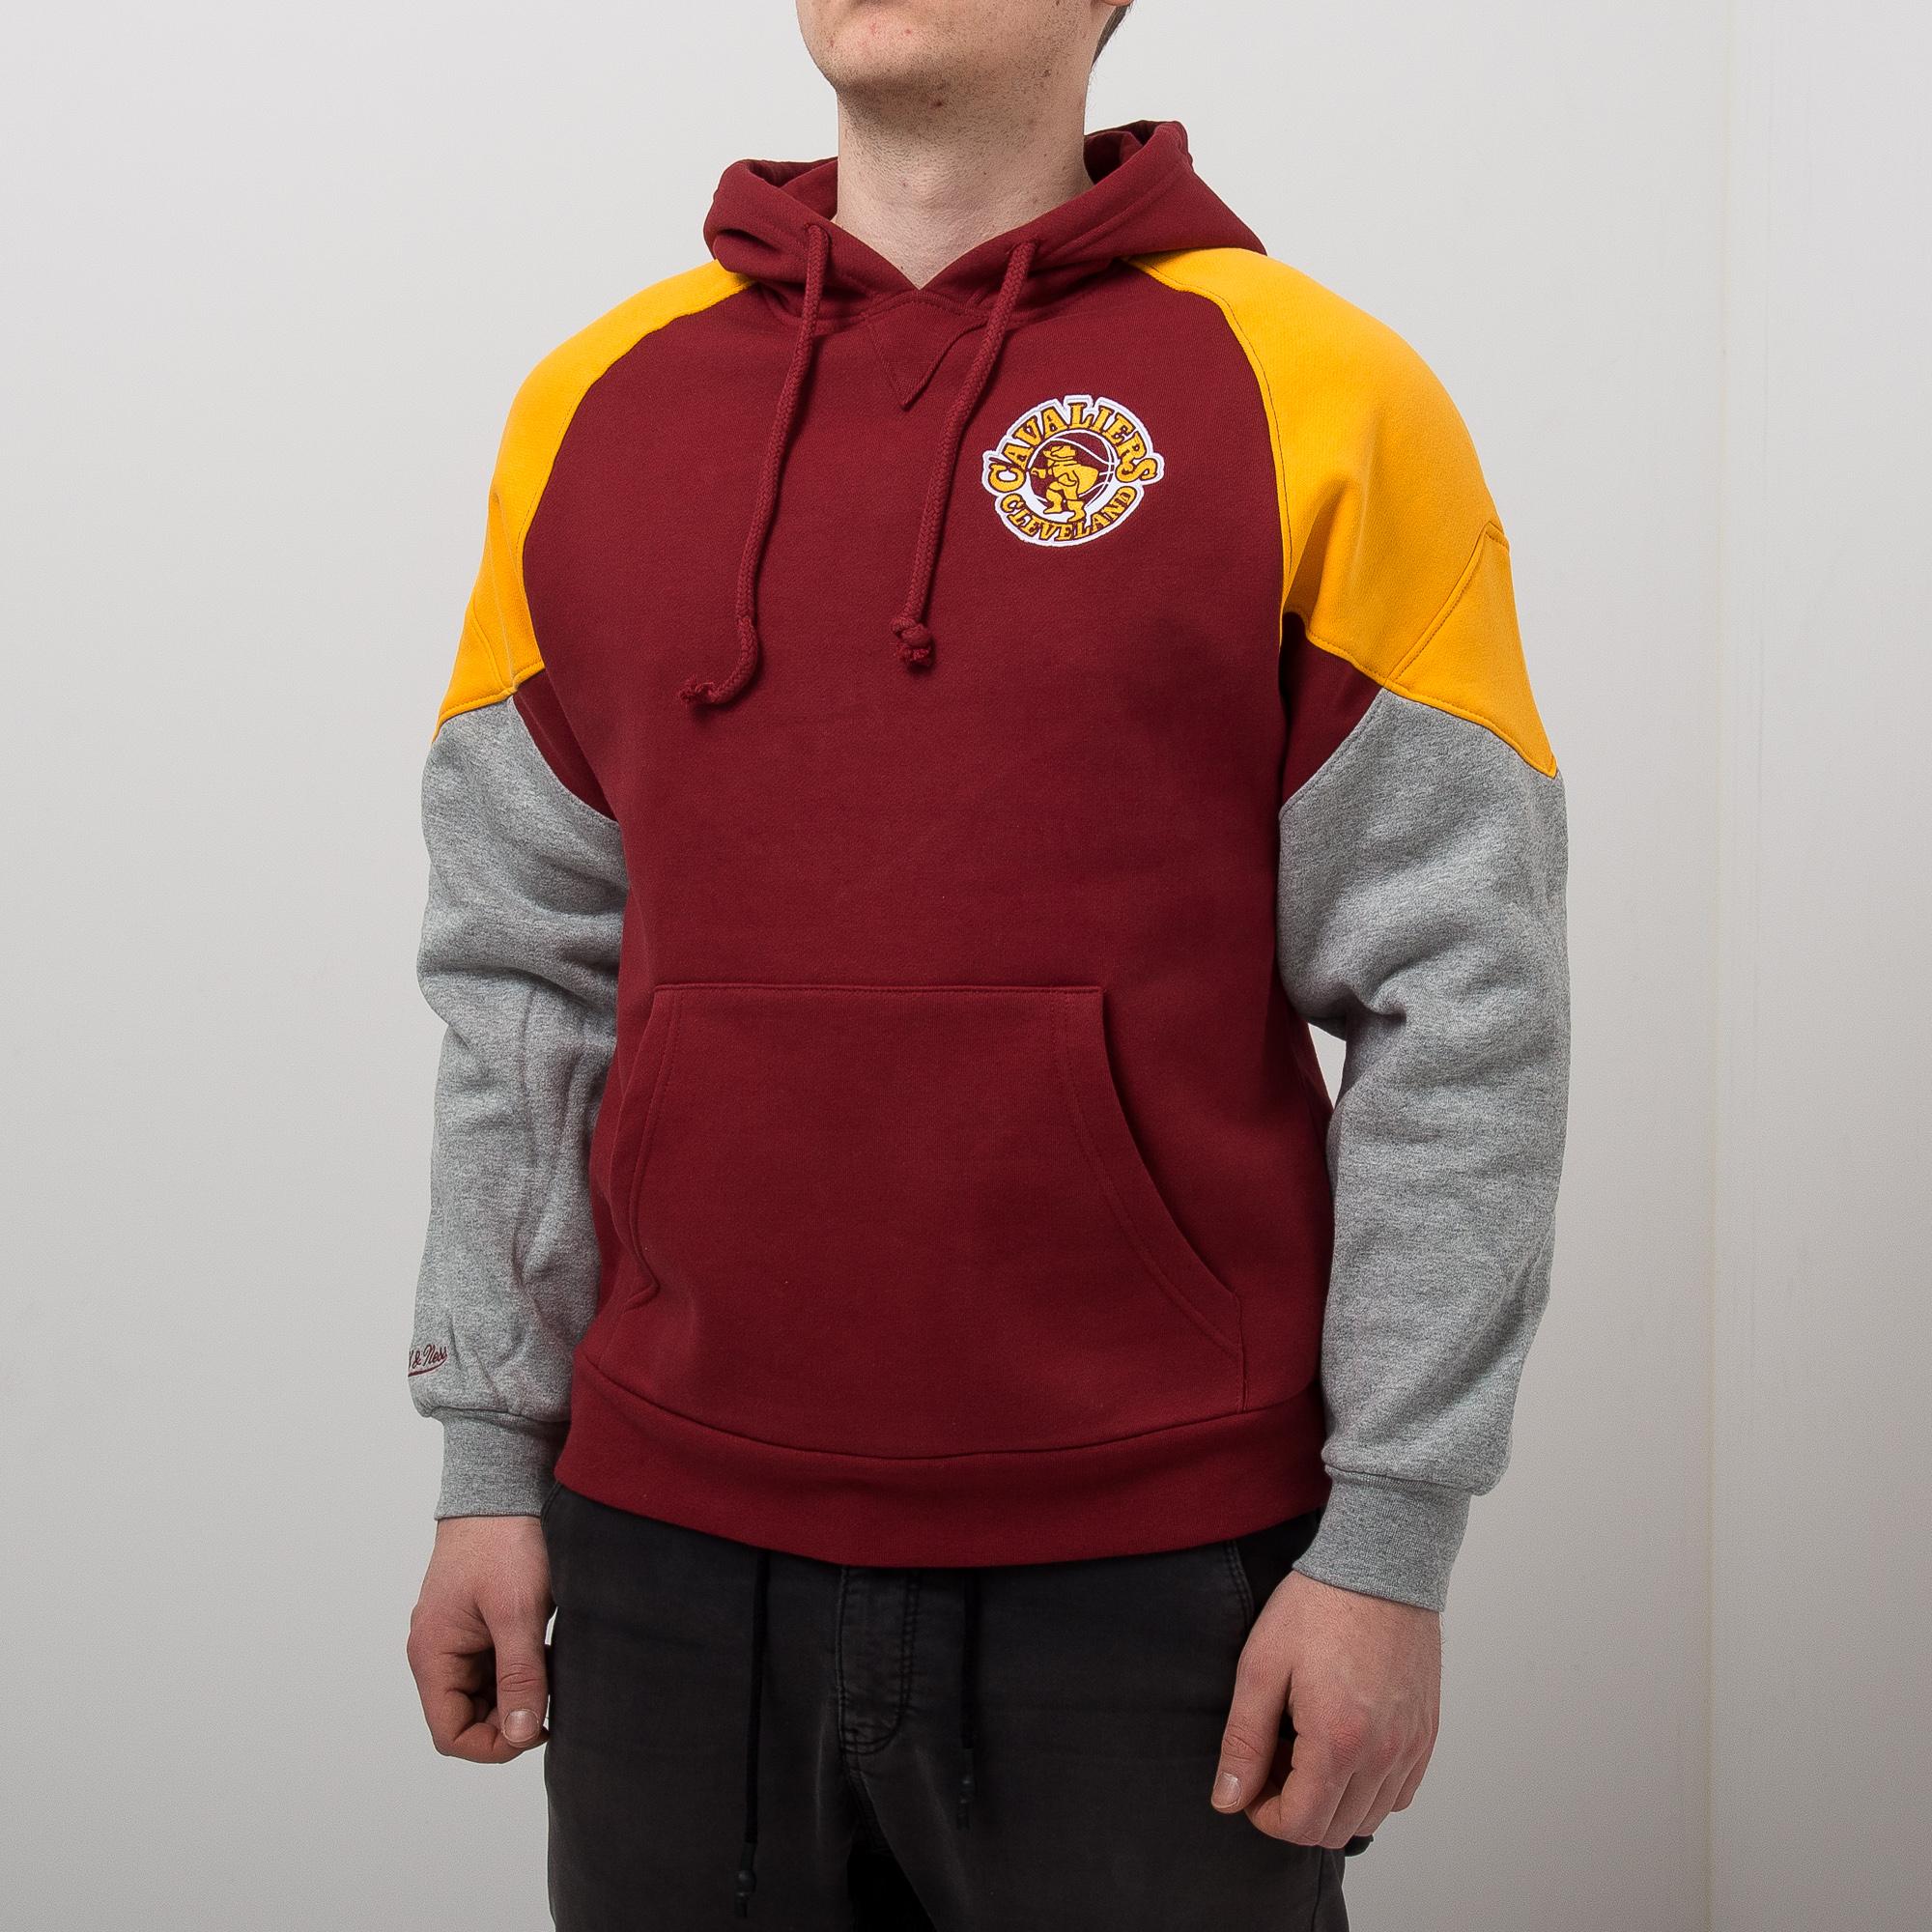 ece74fdce Mitchell & Ness NBA Cleveland Cavaliers Trading Block Hoodie - NBA Shop  Cleveland Cavaliers Merchandise - Superfanas.lt